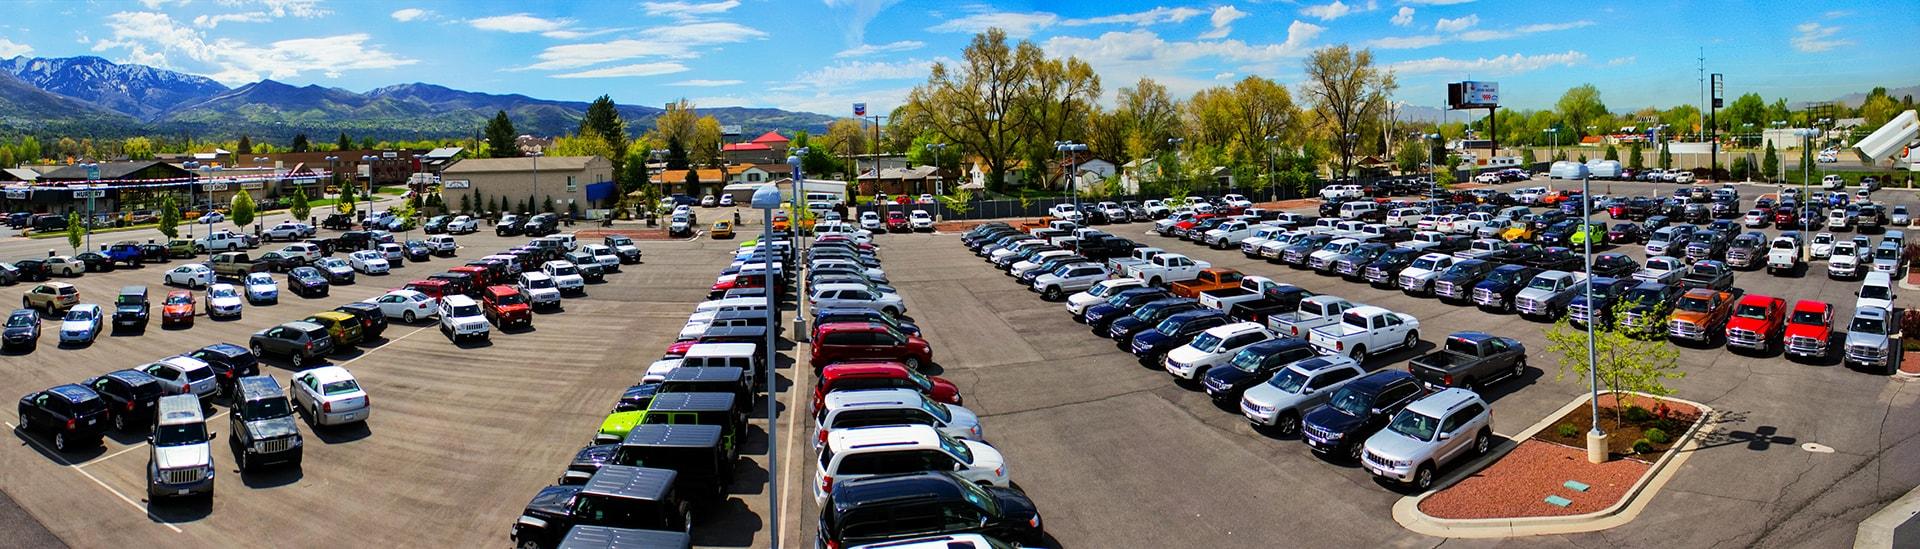 Larry H Miller Bountiful >> New Chrysler Jeep Dodge Ram And Used Car Dealer Serving West